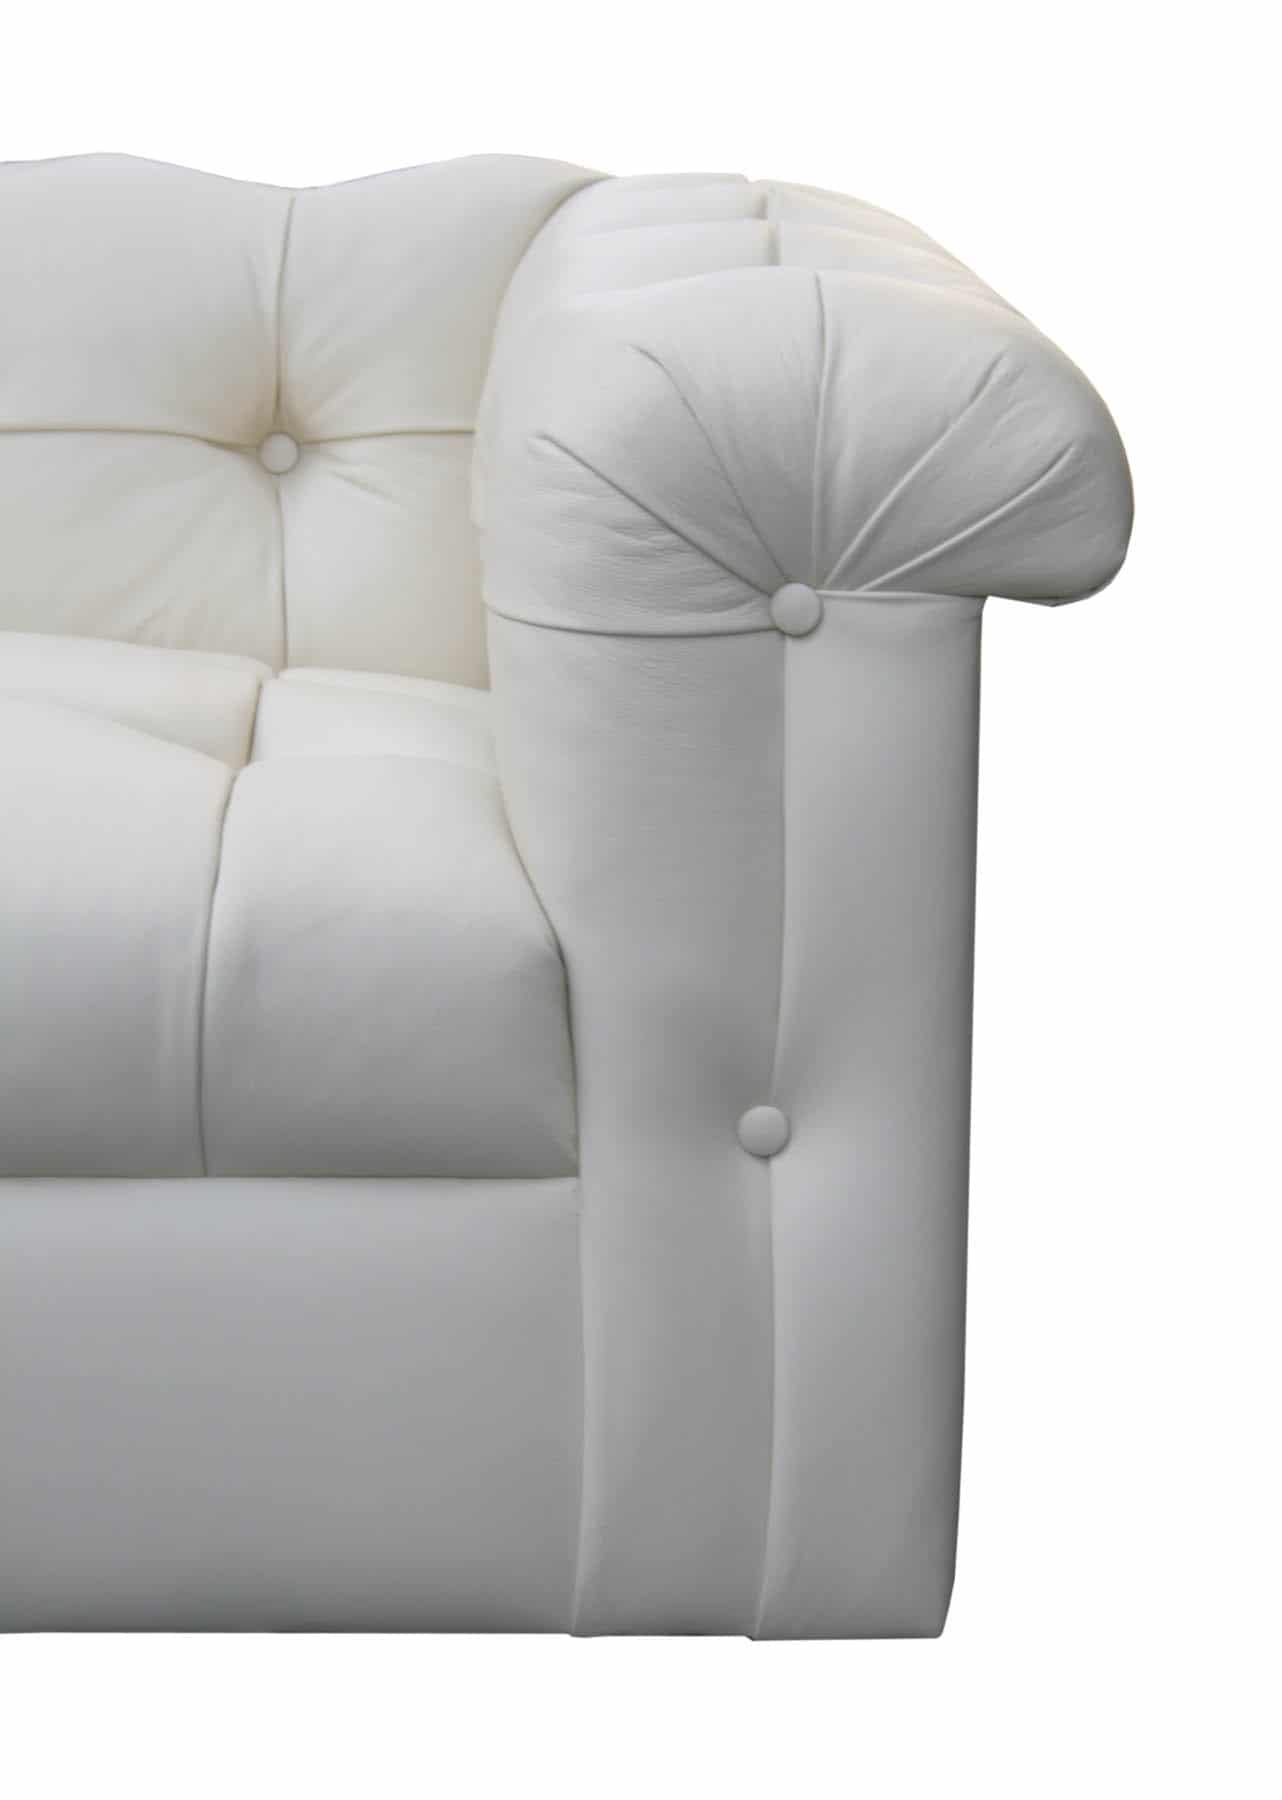 Edward Wormley Dunbar Eight Foot Tufted Leather Sofa